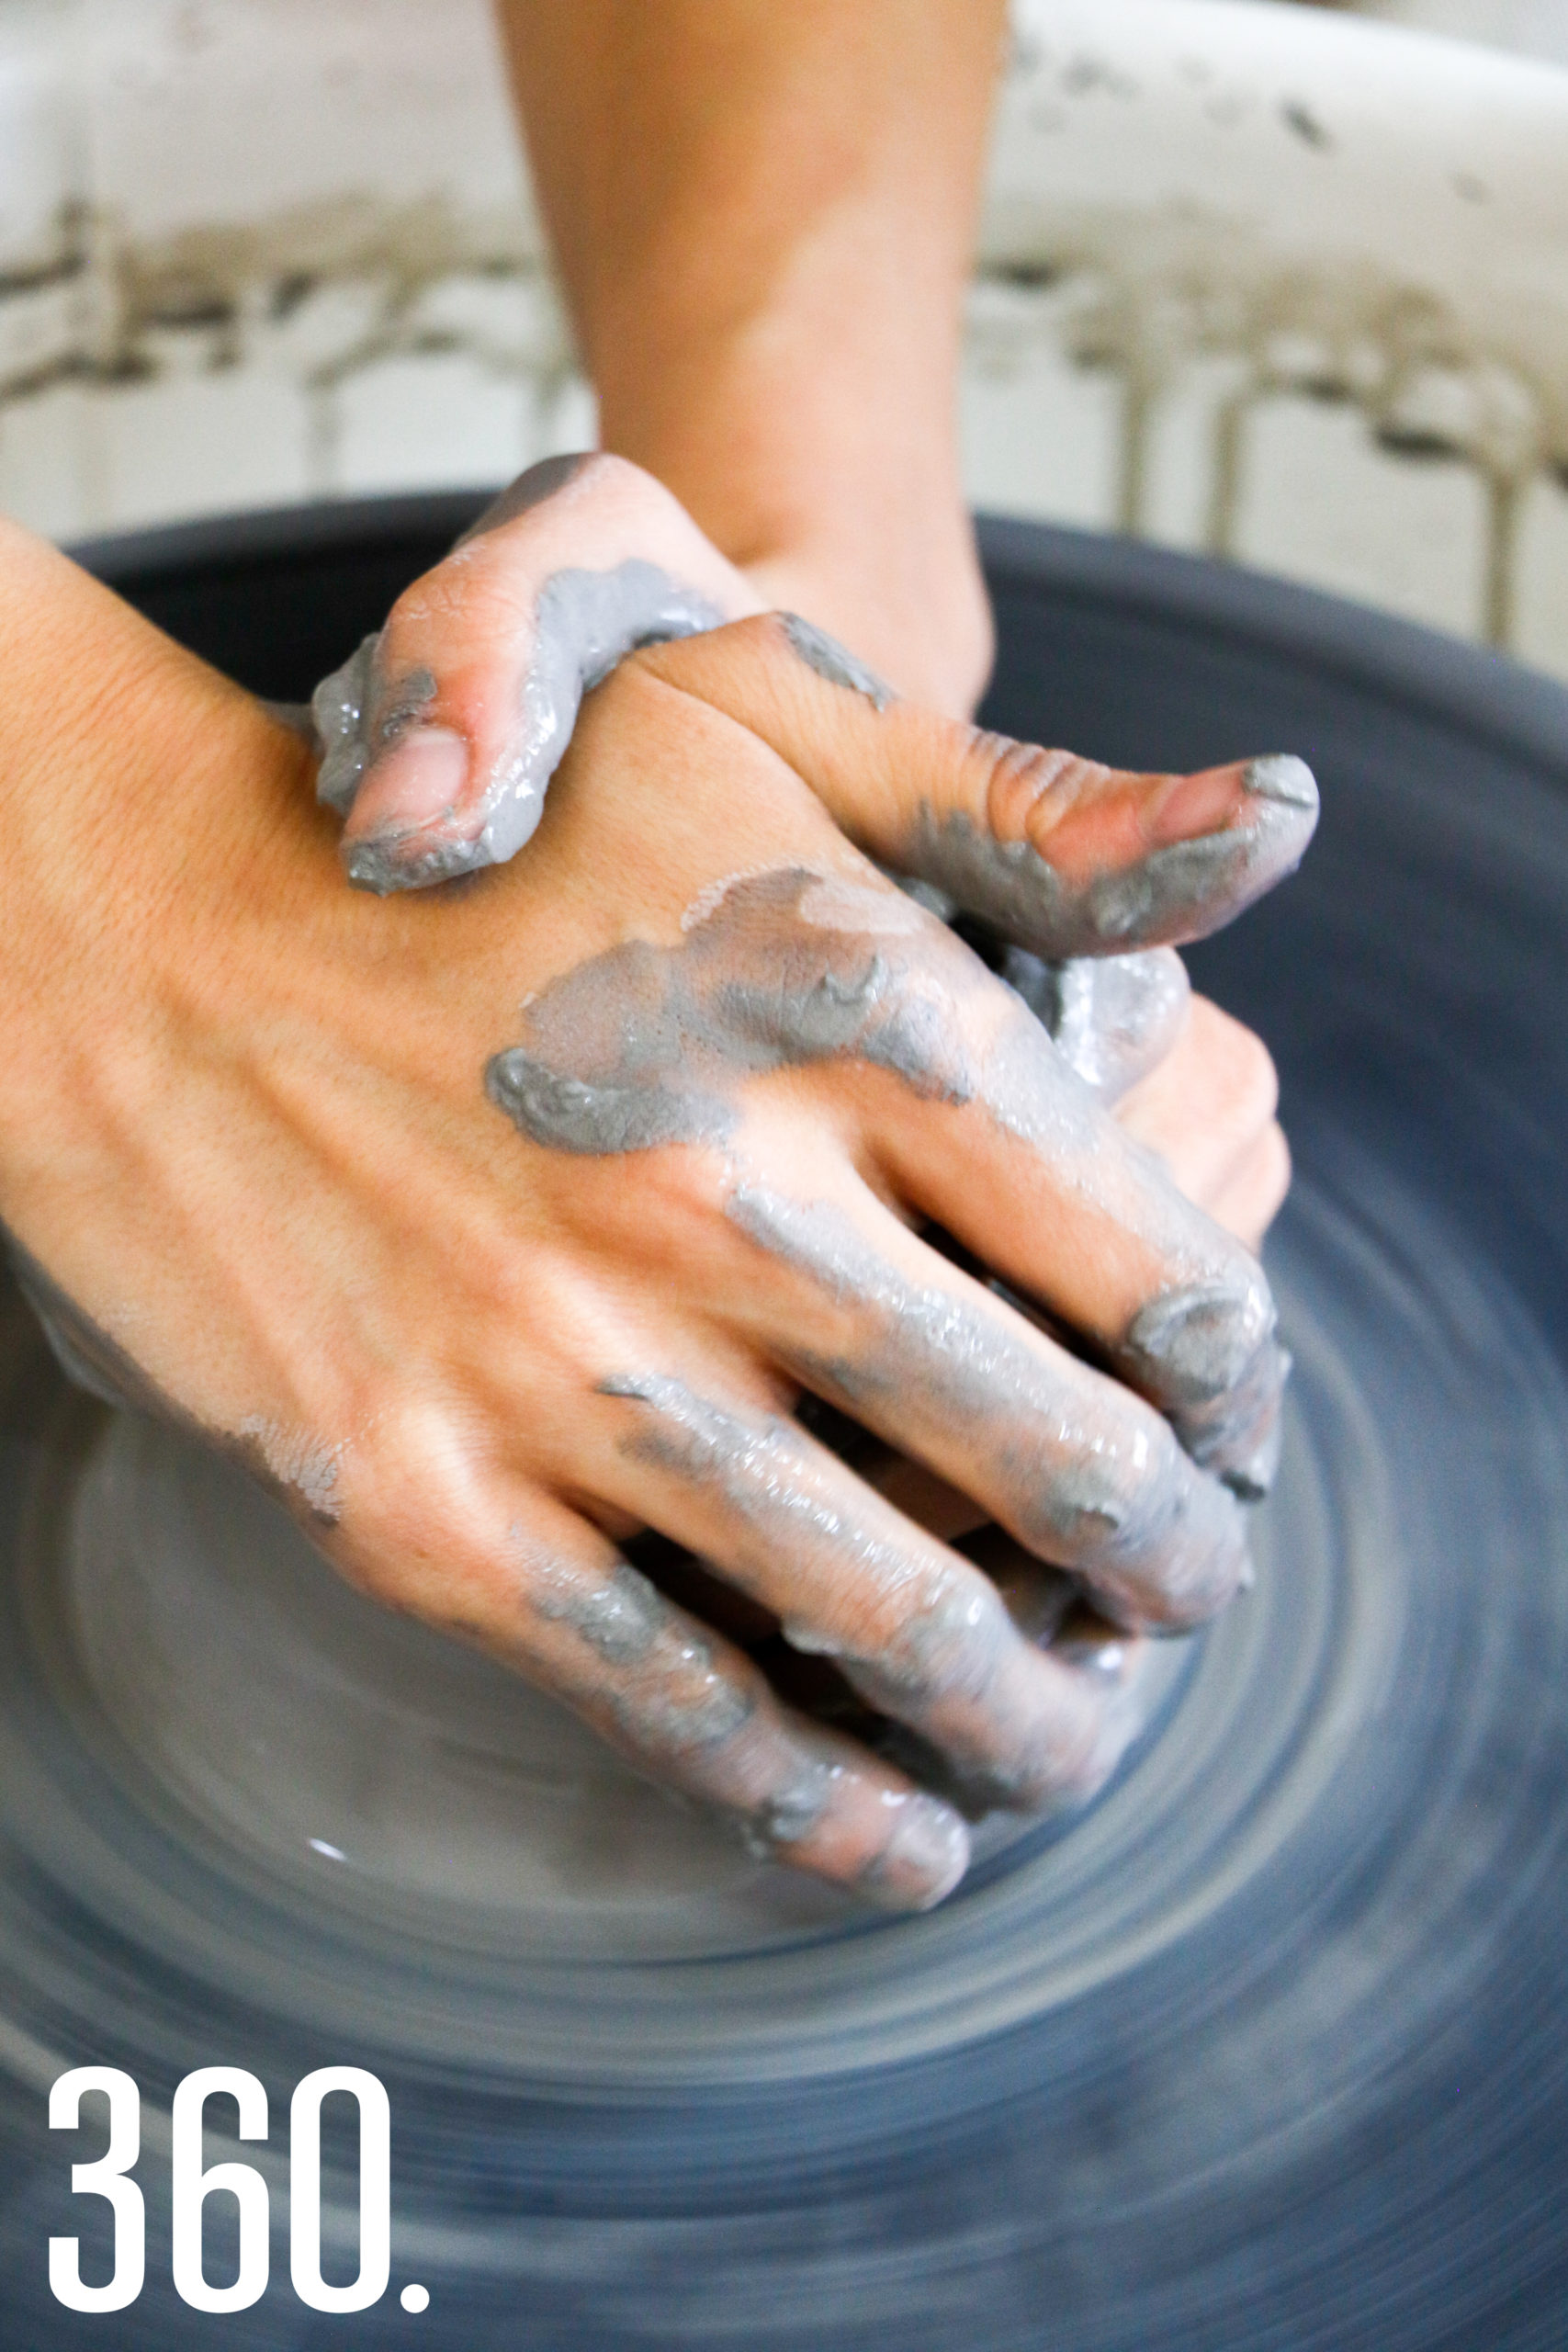 Trabajando la cerámica.